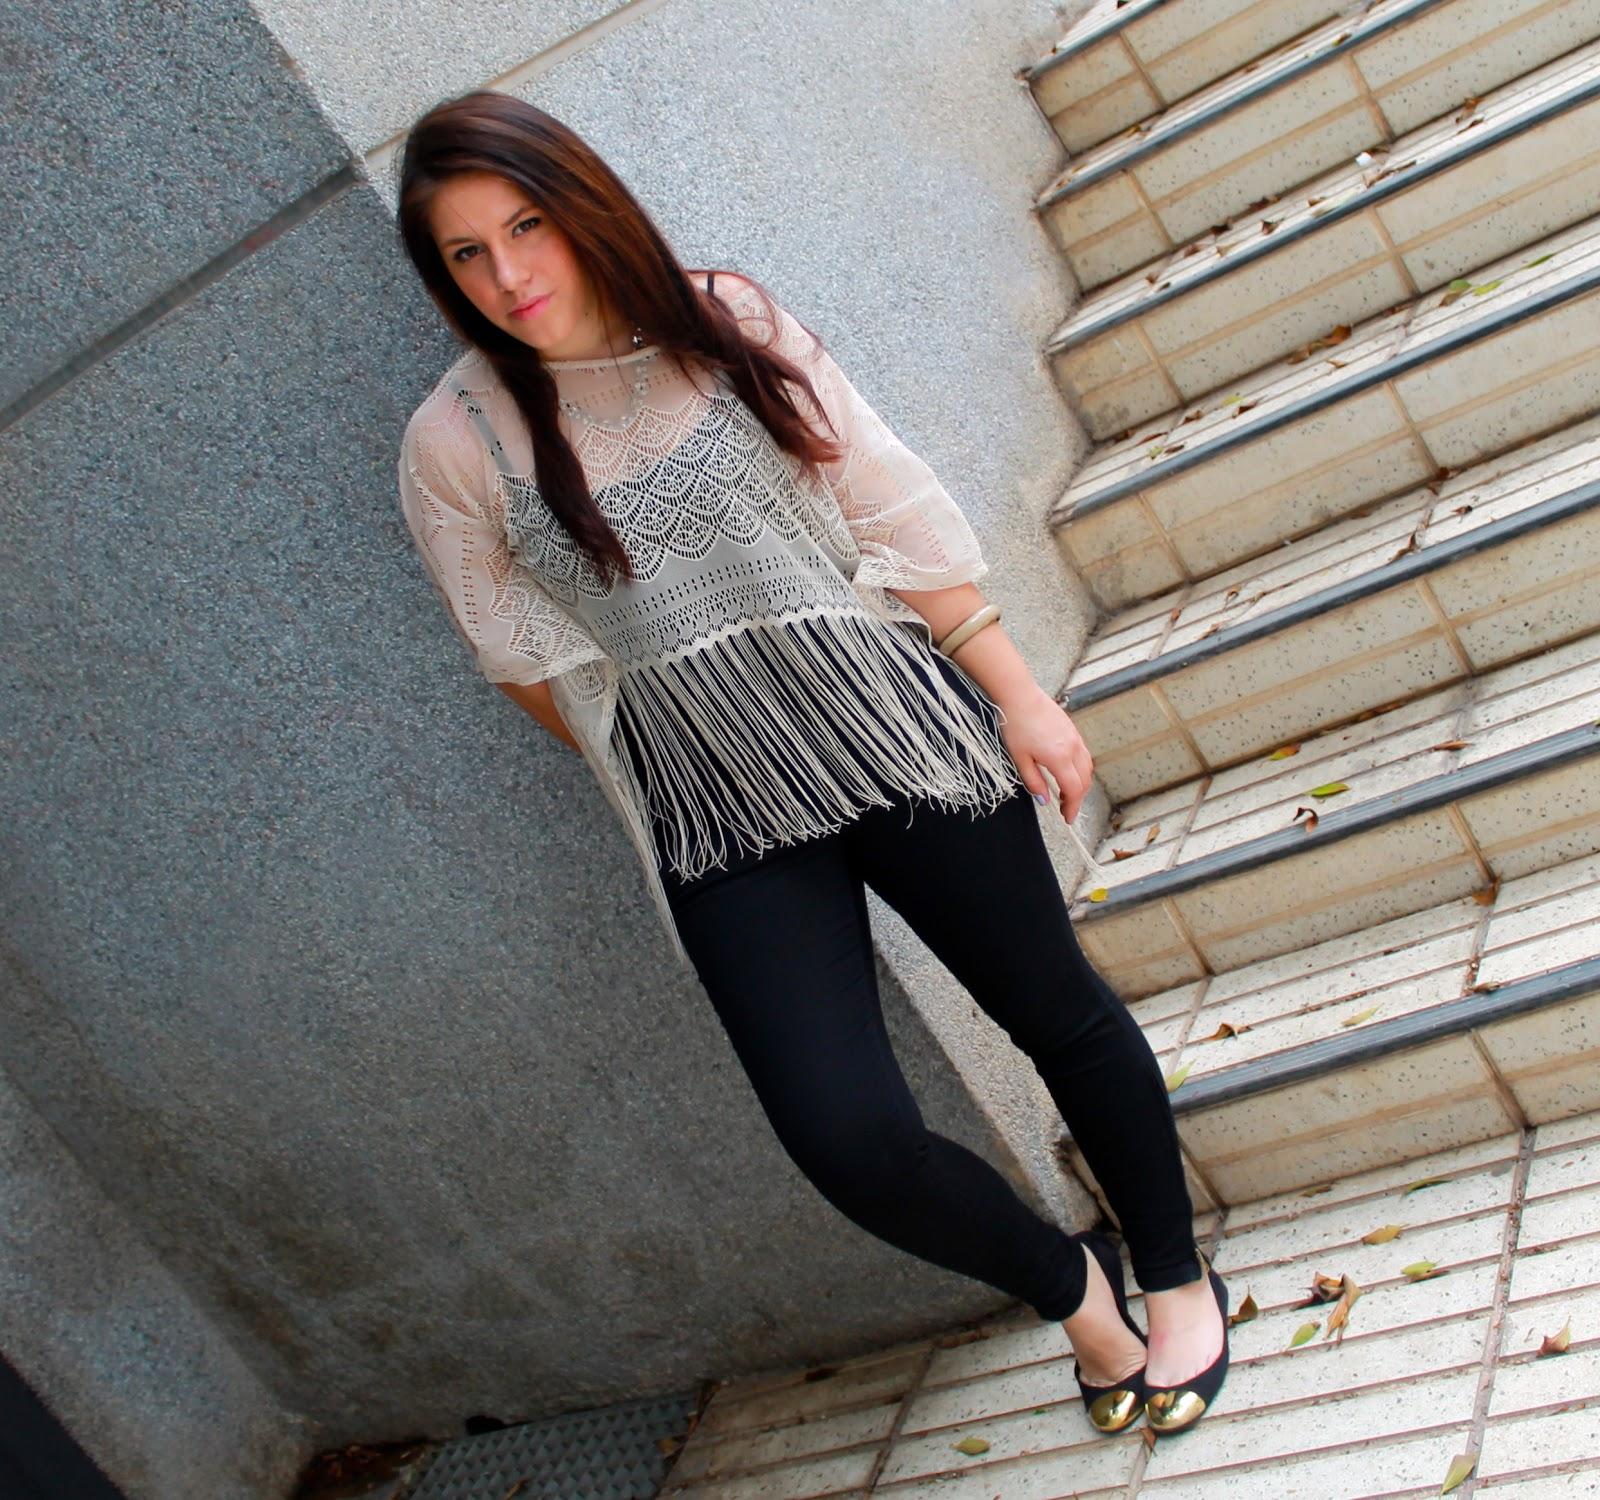 Miss Anni Aurélie : My Life be like ...: http://missanniaurelie.blogspot.com/2013/03/my-life-be-like.html